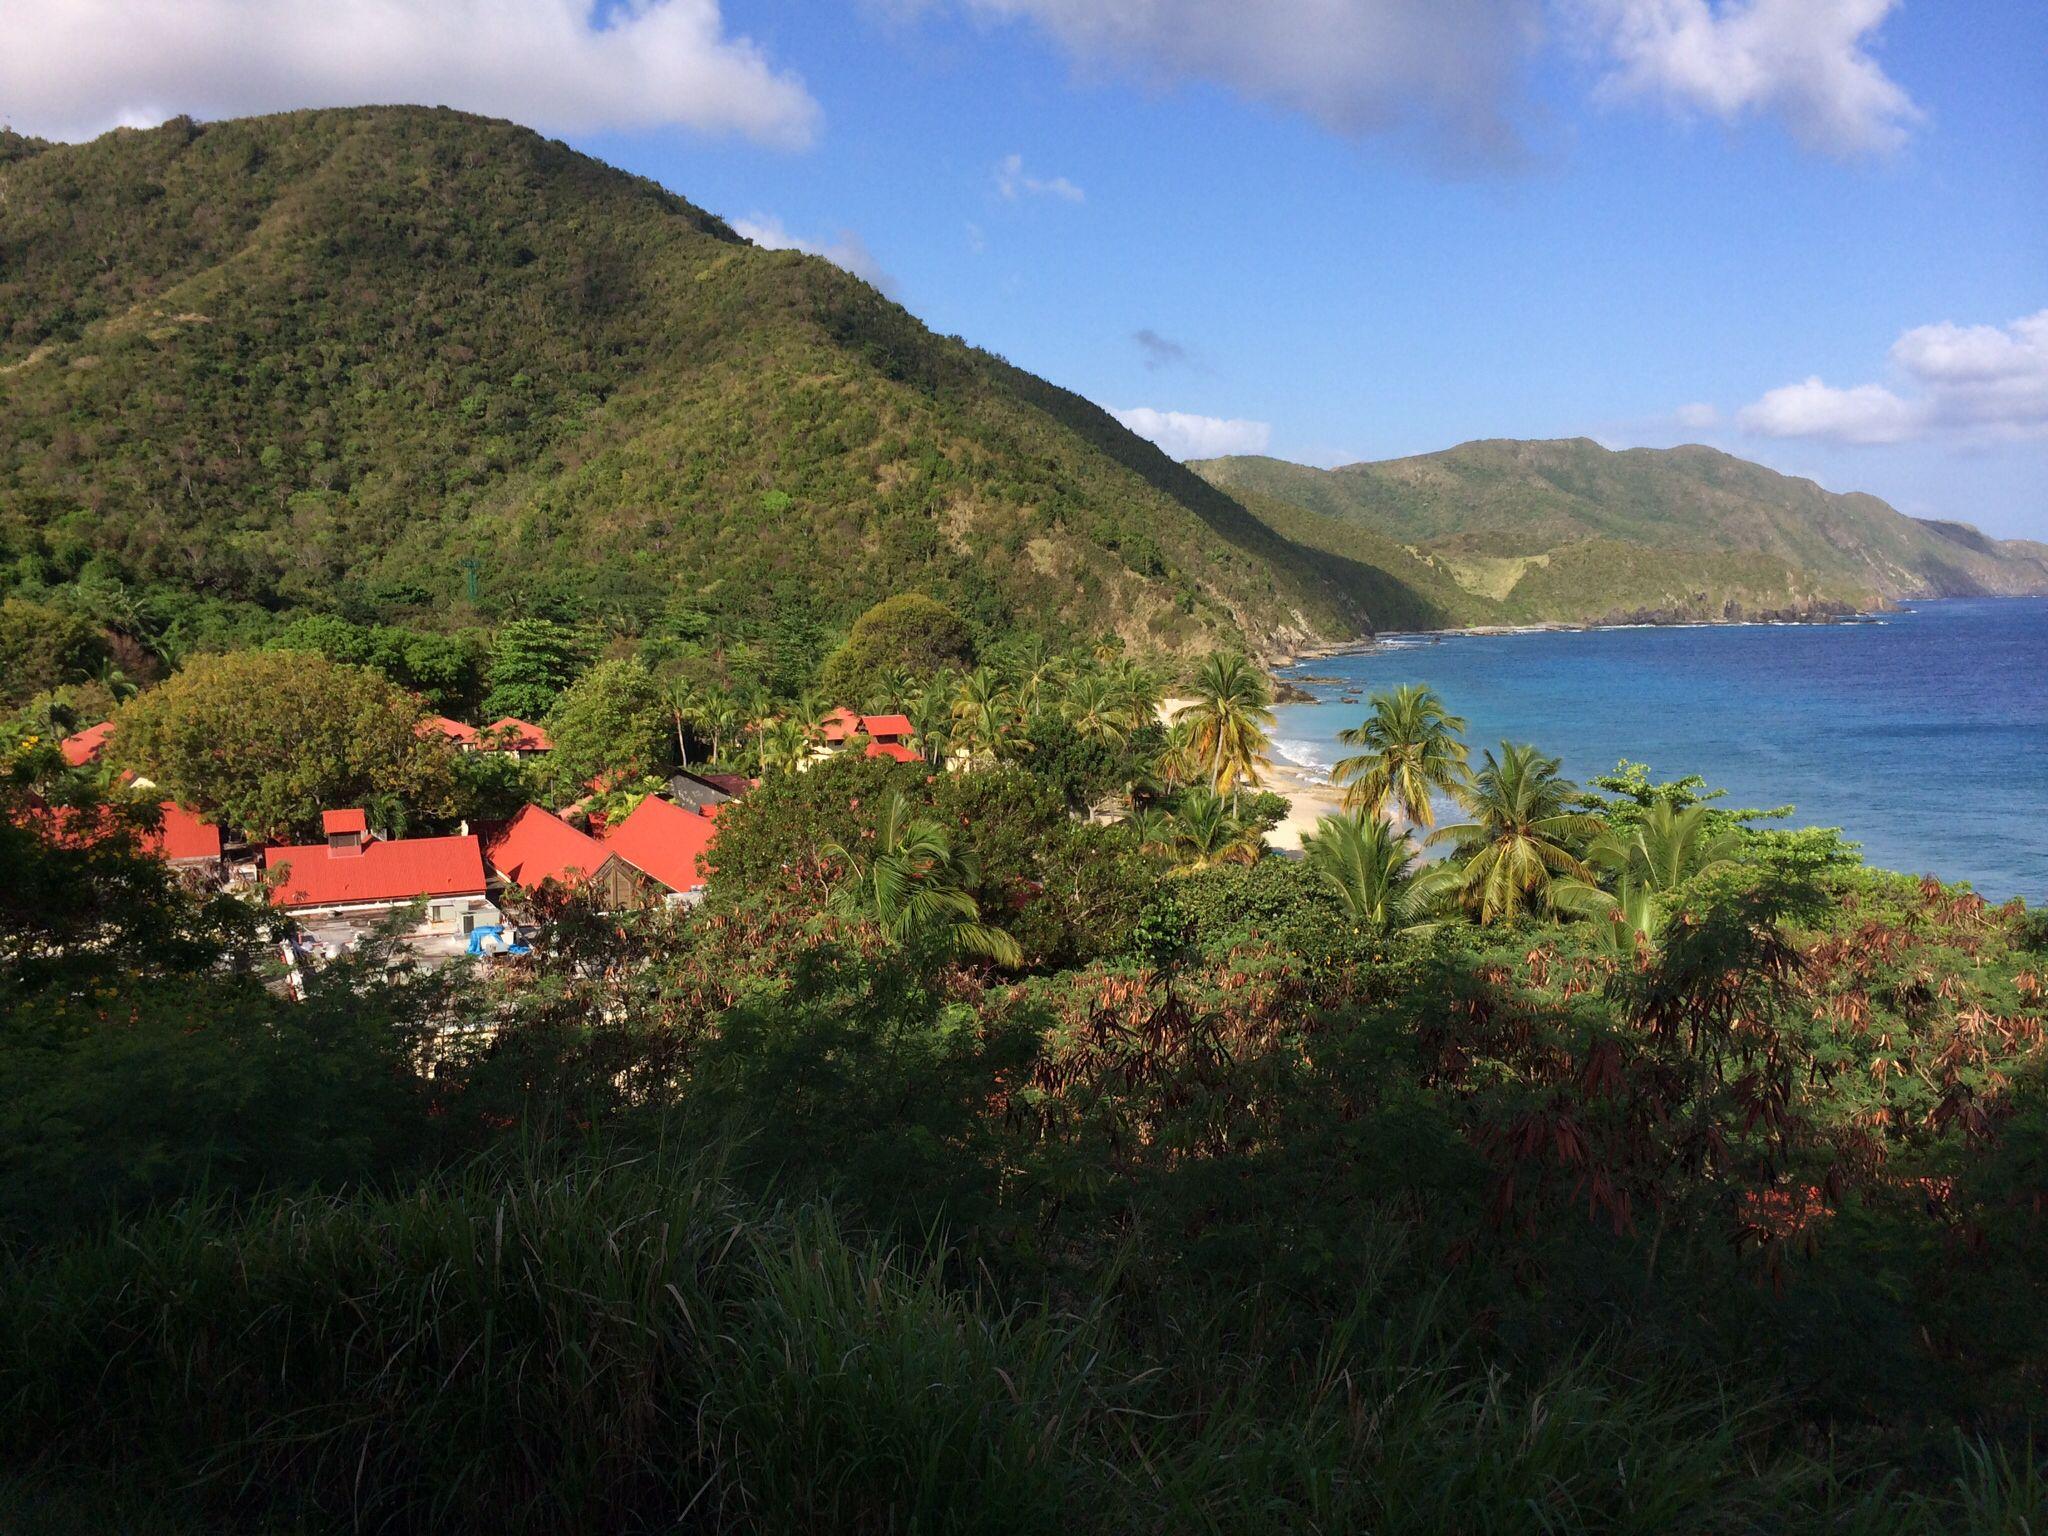 Renaissance Marriott Carambola Beach Resort St Croix Usvi Favorite Places Amp Spaces